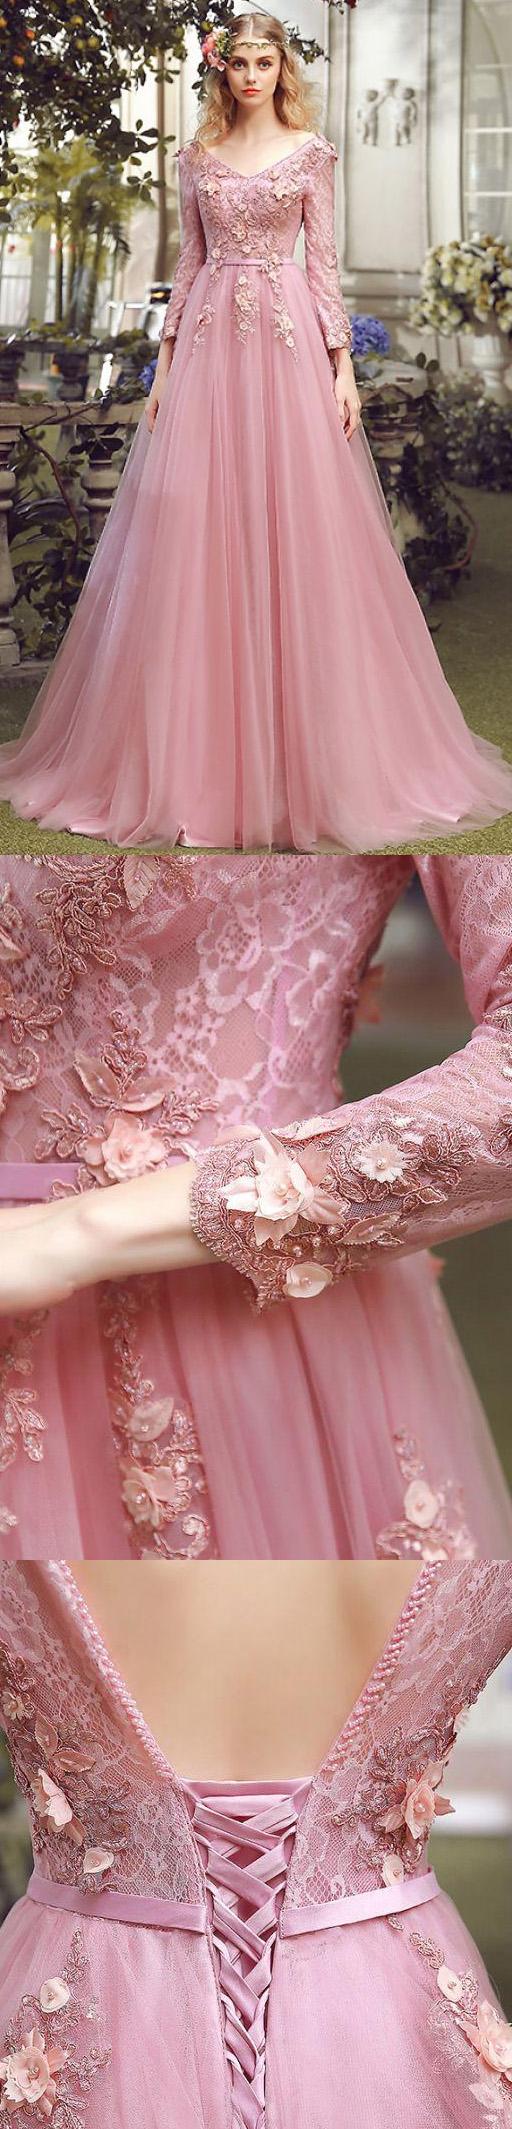 Lace evening dresses pink alineprincess evening dresses long